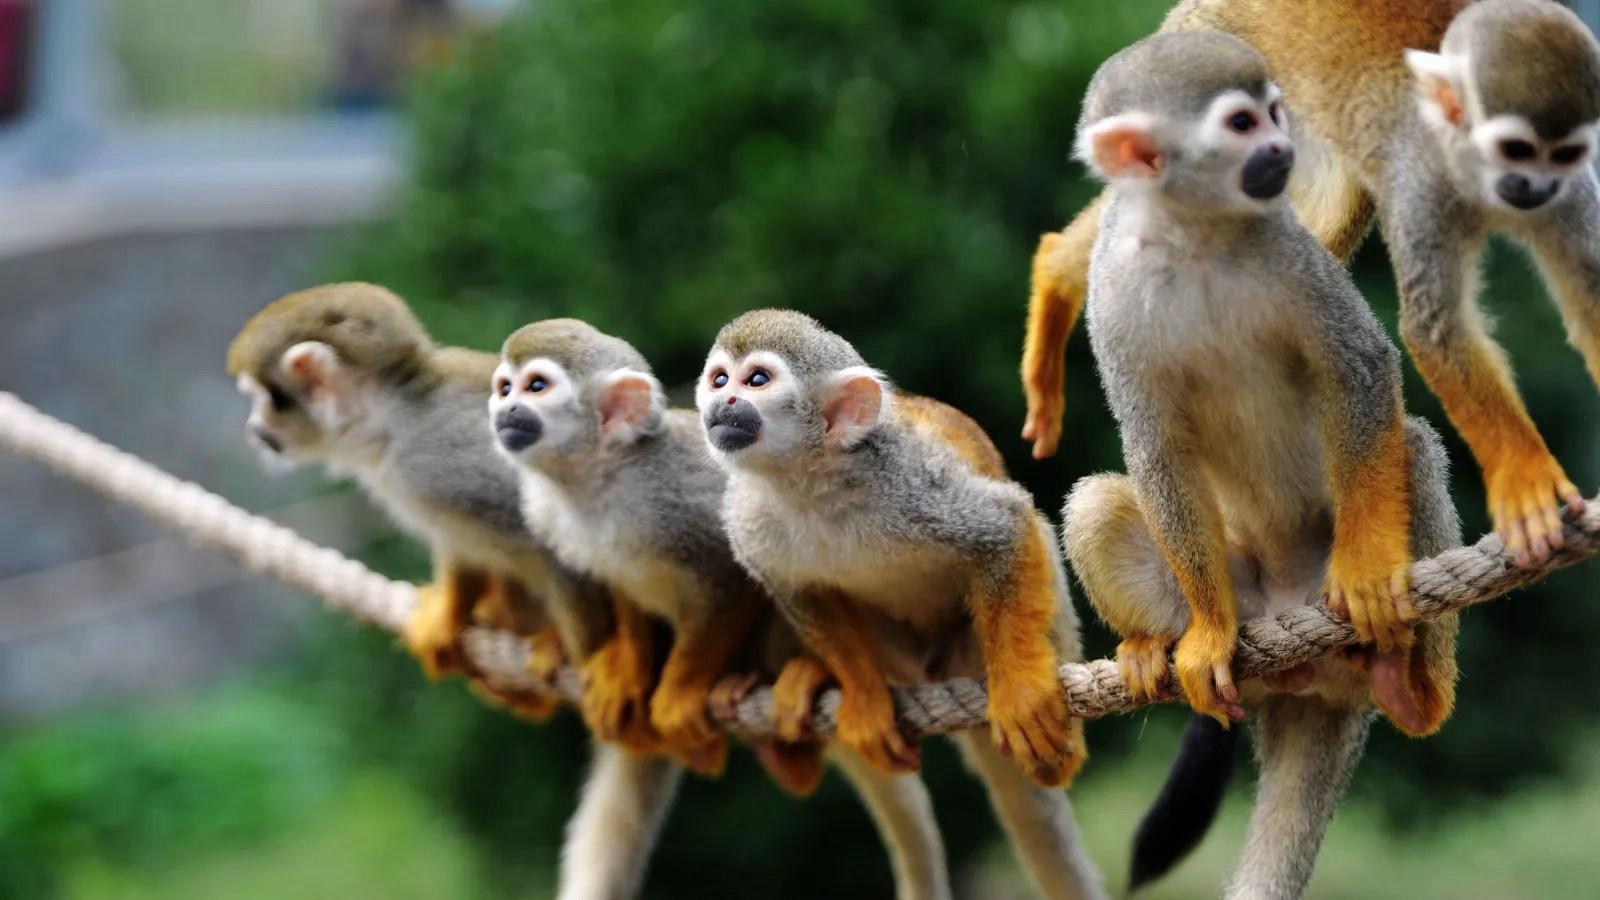 Monkeys And Bananas Cute Wallpaper Instagram Is Warning Users That Cute Exotic Animal